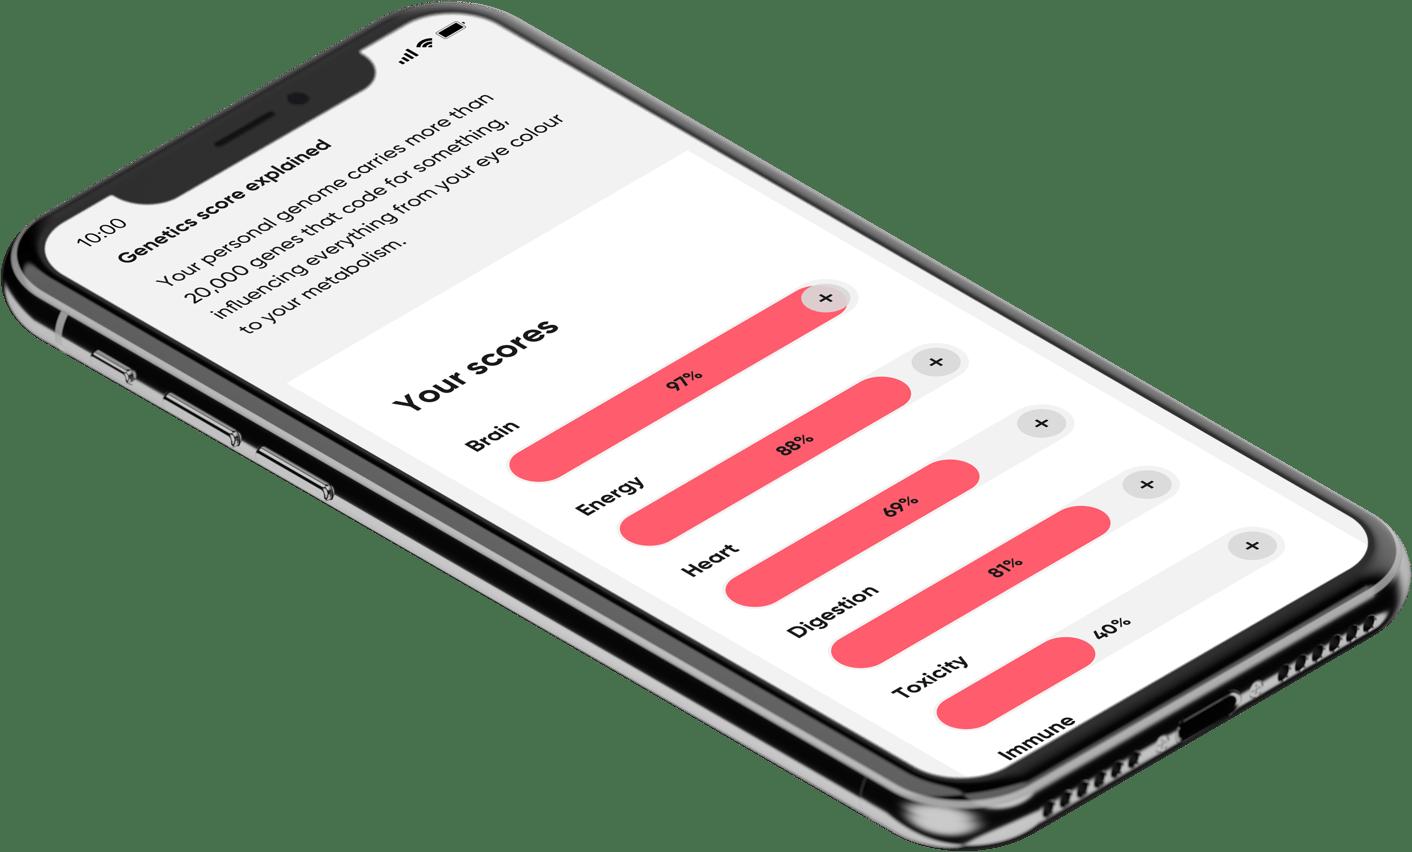 Phone with sub scores